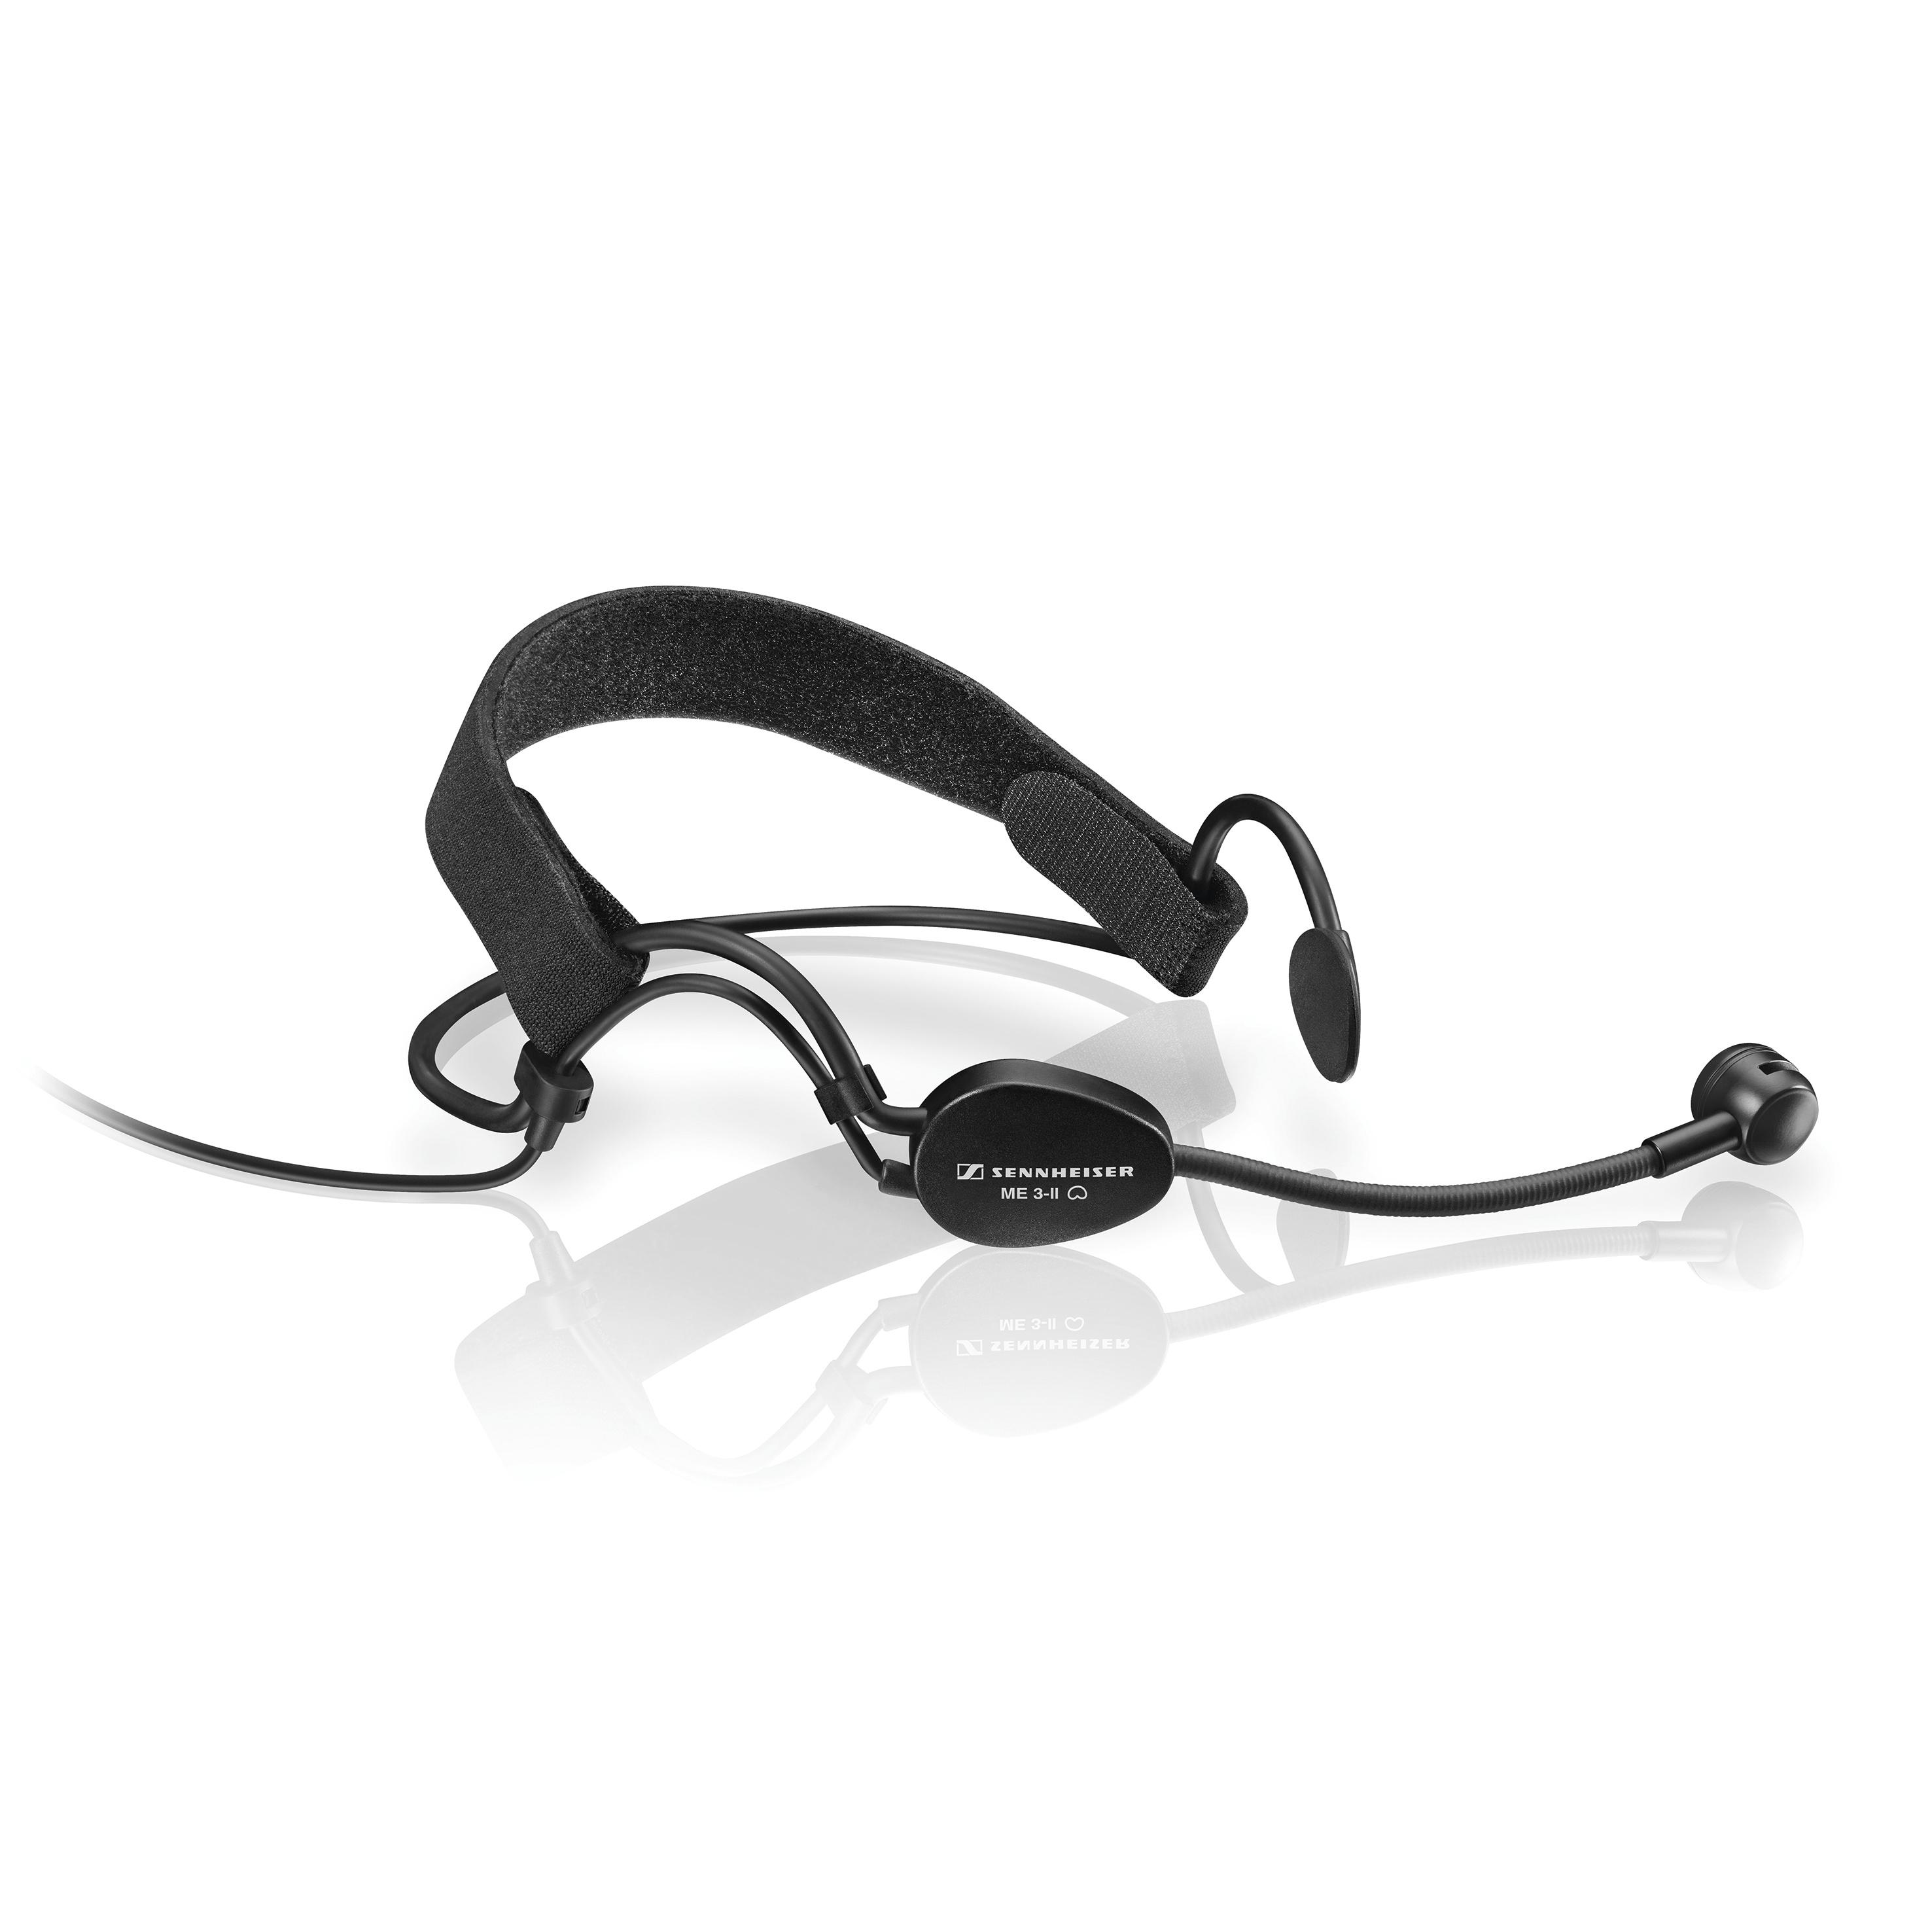 Sennheiser ME 3-II Headset-Mikrofon 235295